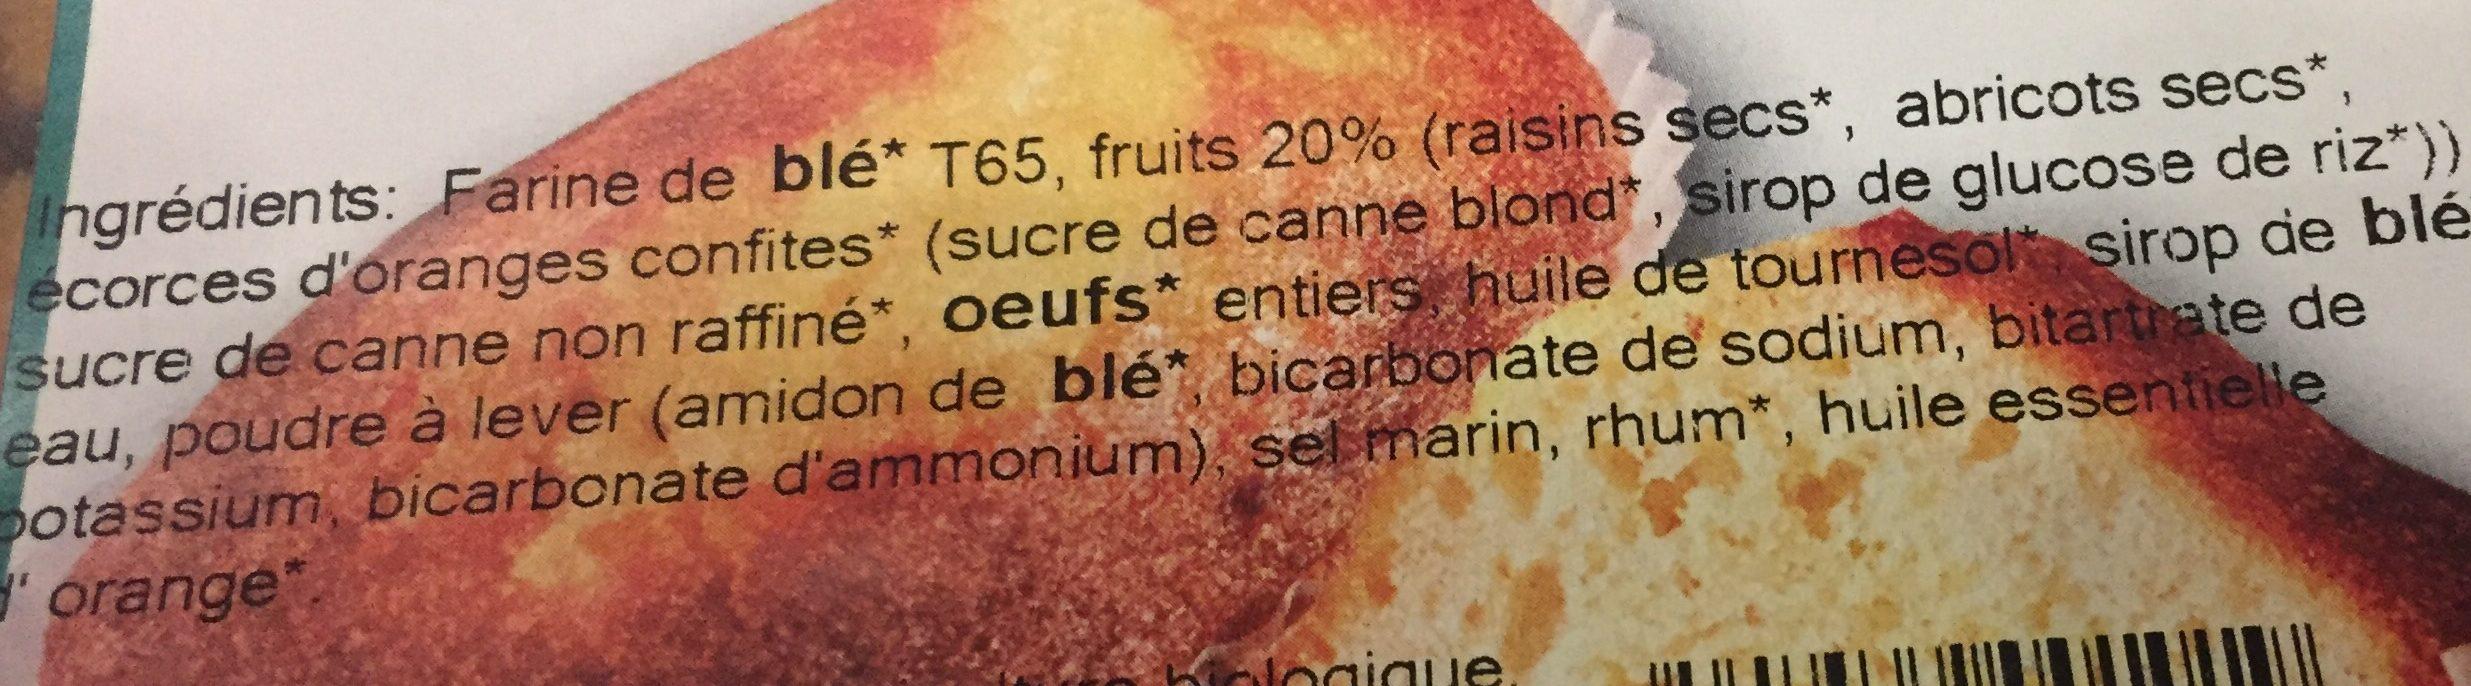 16 cakes aux fruits bio - Ingrediënten - fr